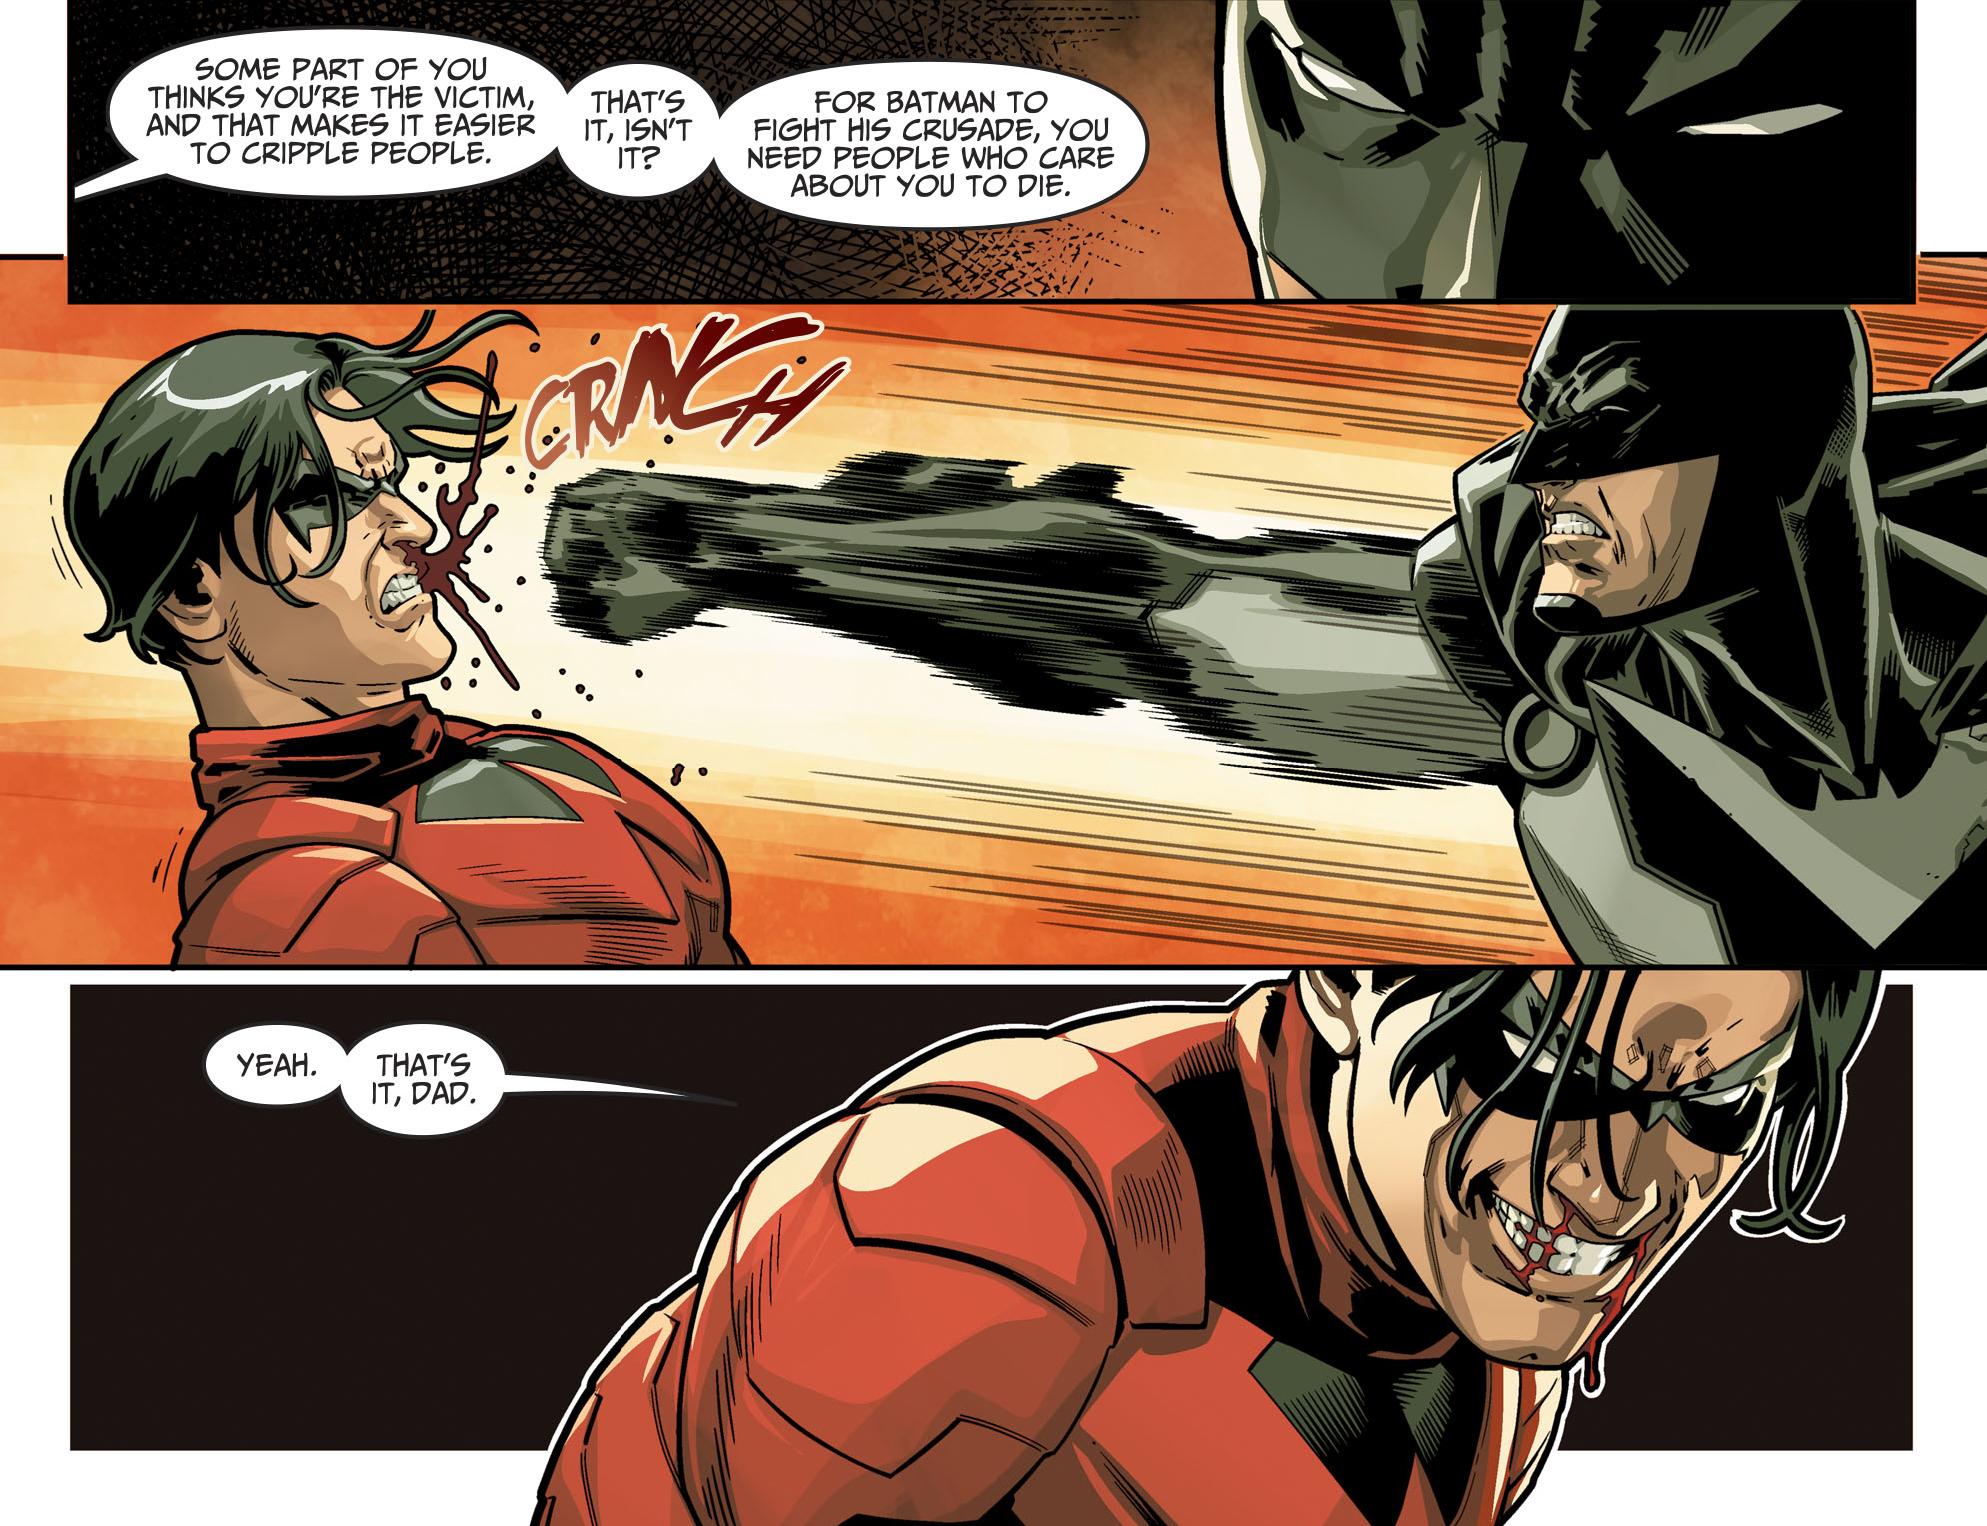 Batman VS Nightwing (Injustice II)